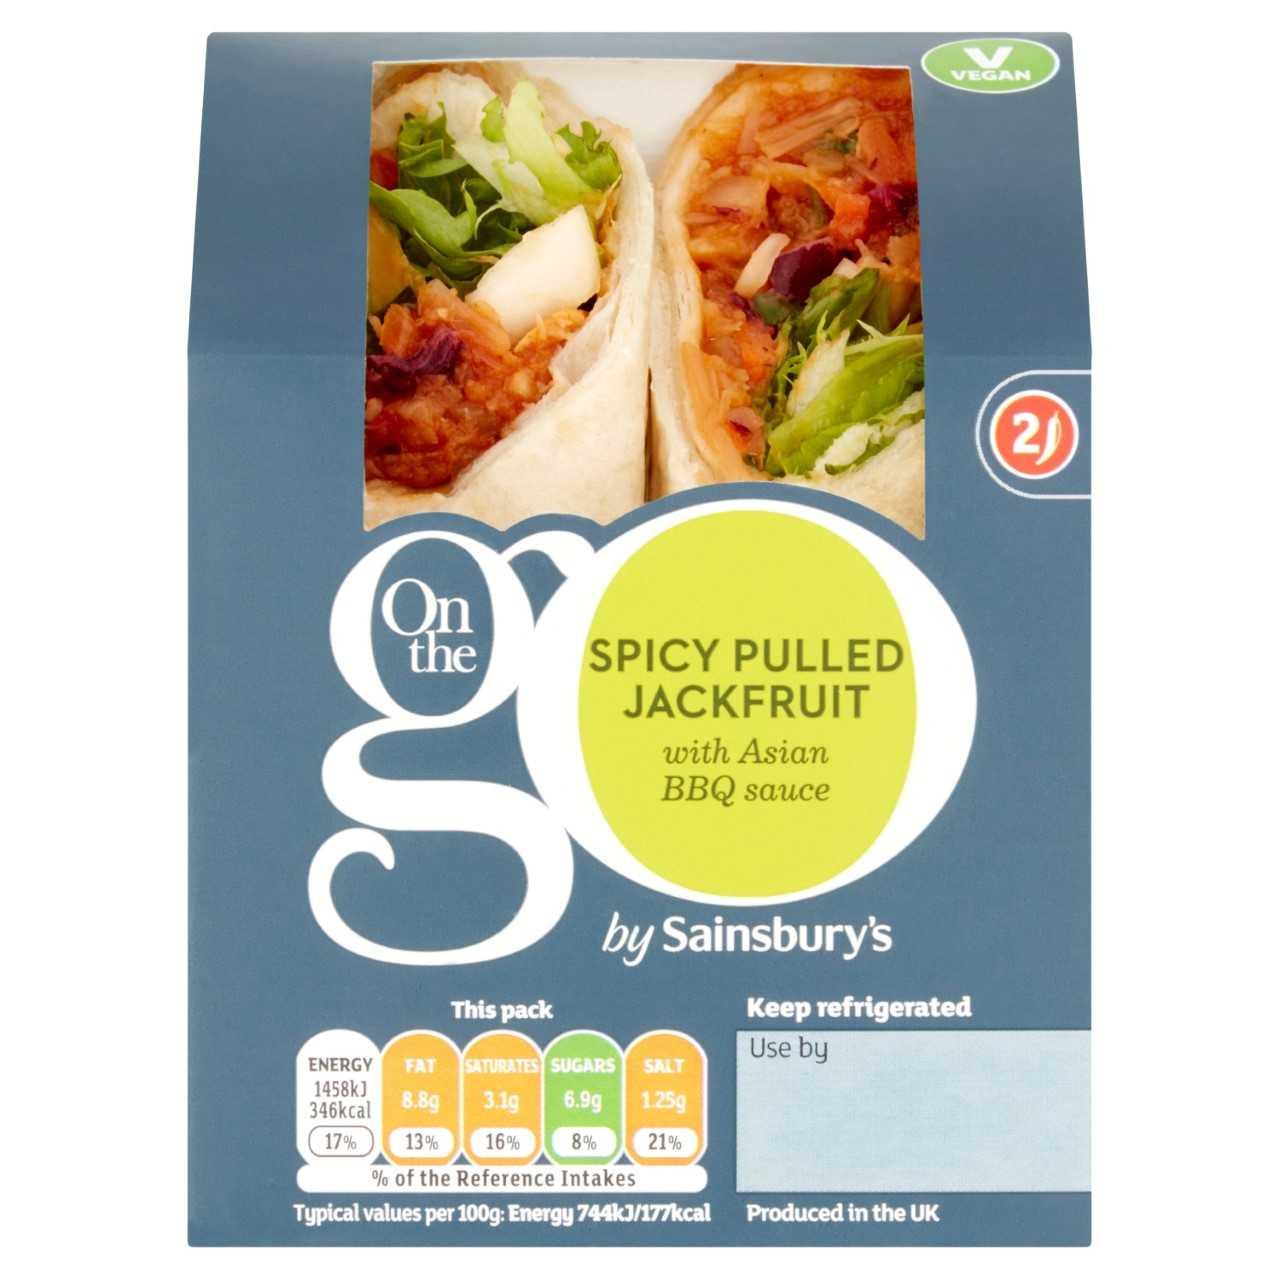 Sainsbury's Vegan Sandwiches Spicy Pulled Jackfruit Wrap